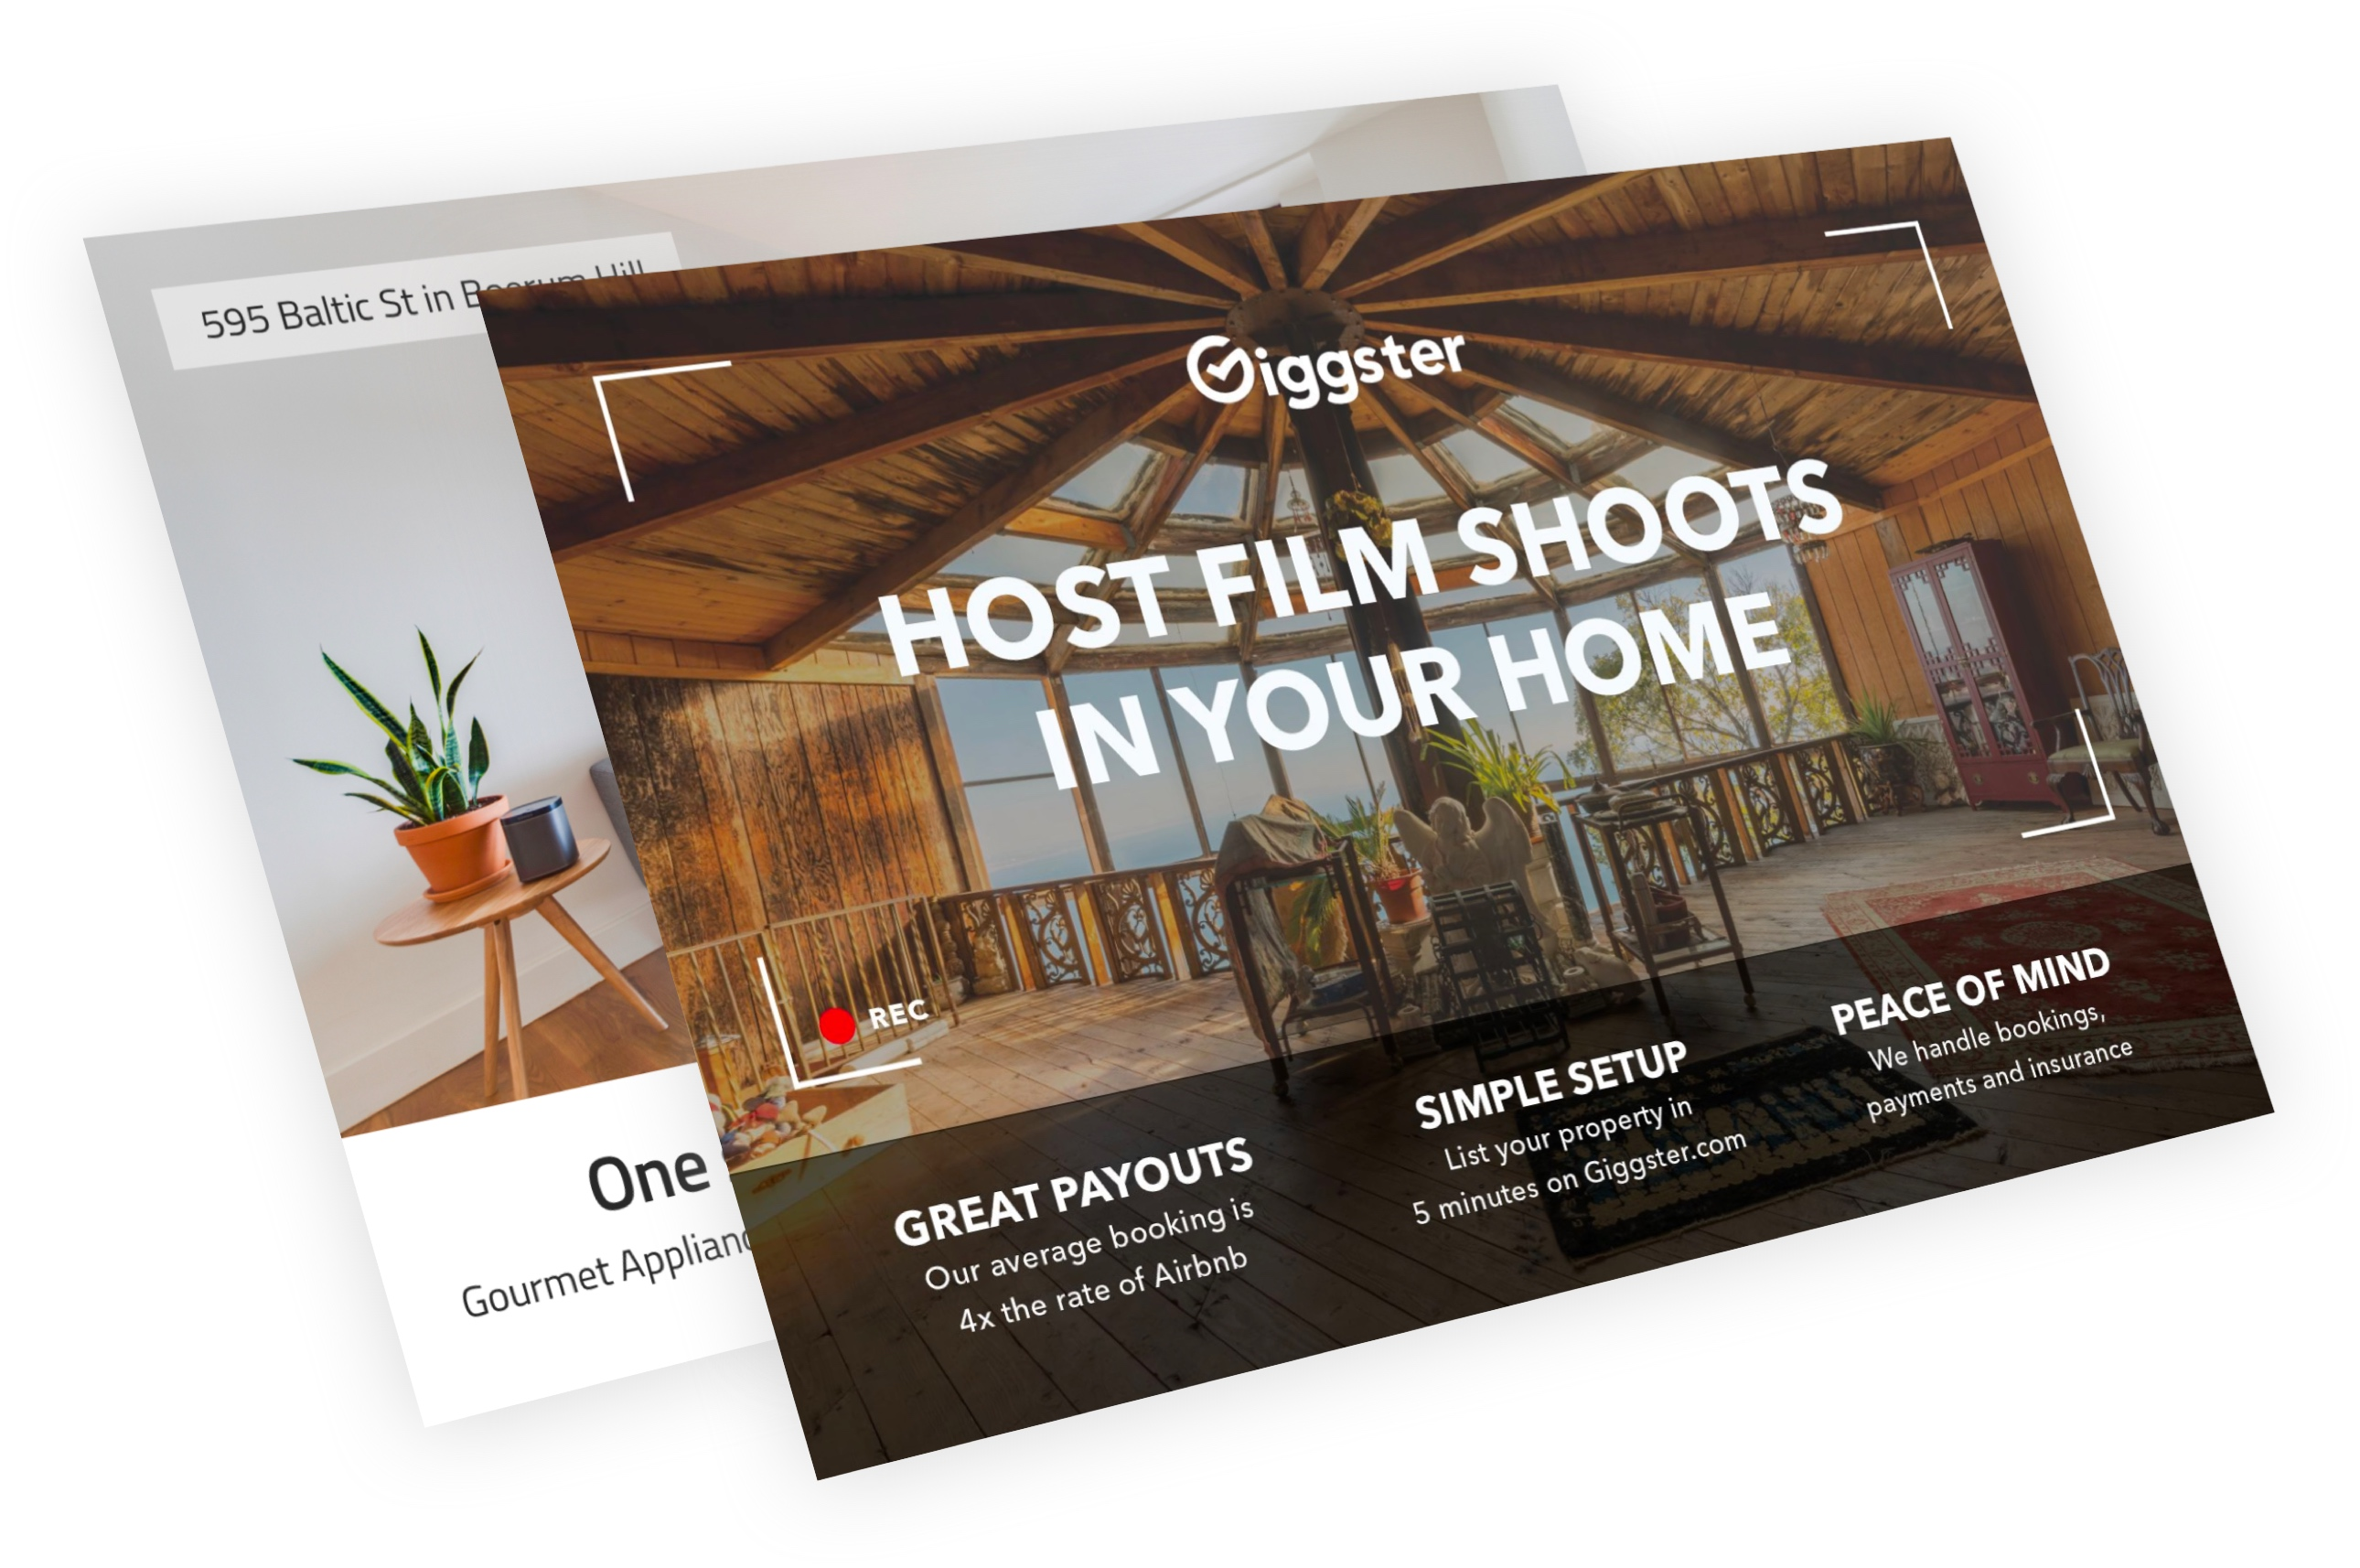 DIY postcard marketing for Shopify merchants | Mailjoy